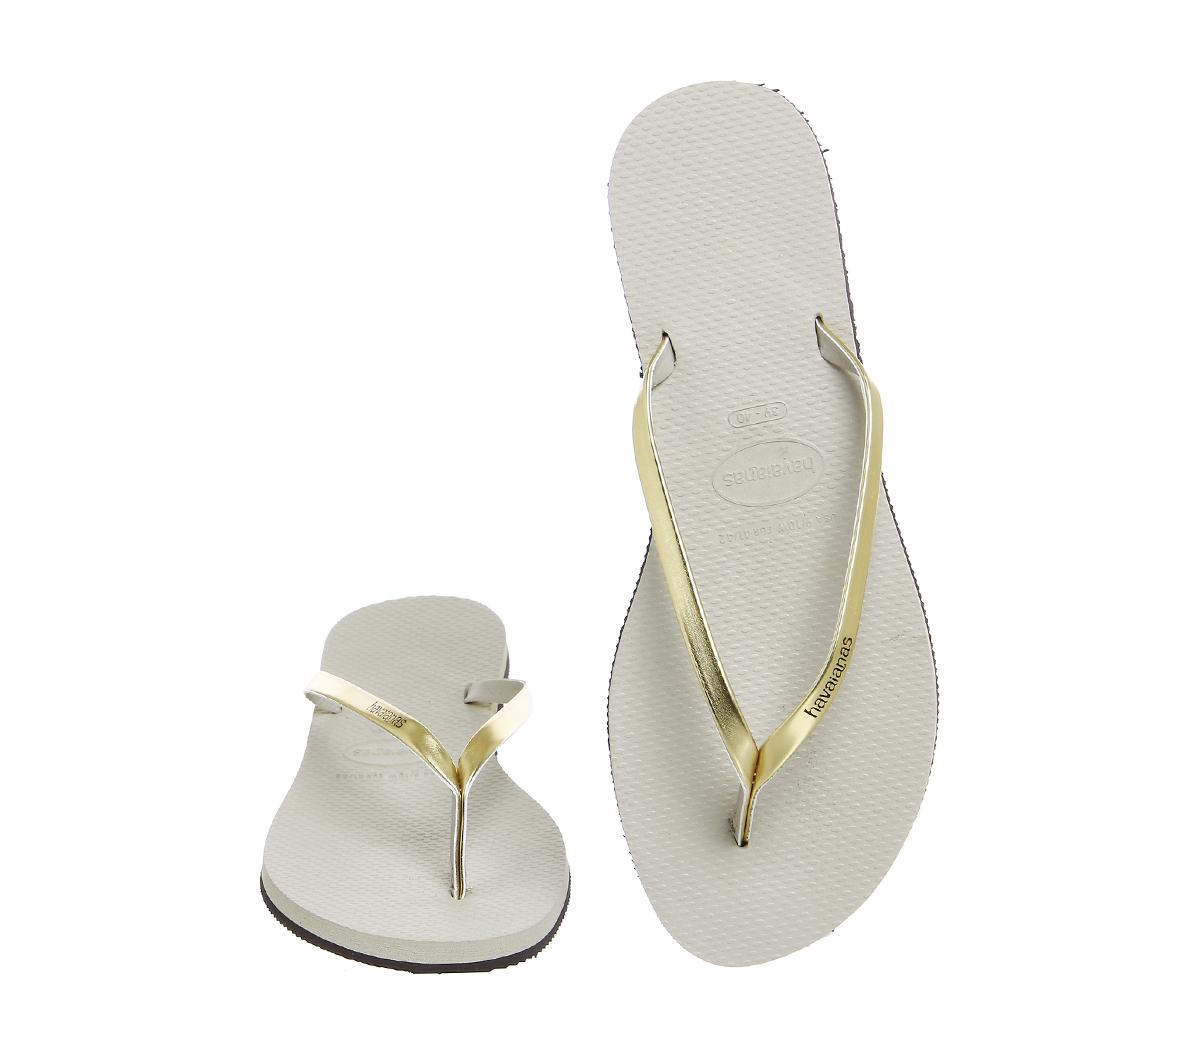 49cf112c3b6a Sentinel Womens Havaianas Slim You Metallic Flip Flop Sand Grey Light Gold  Sandals